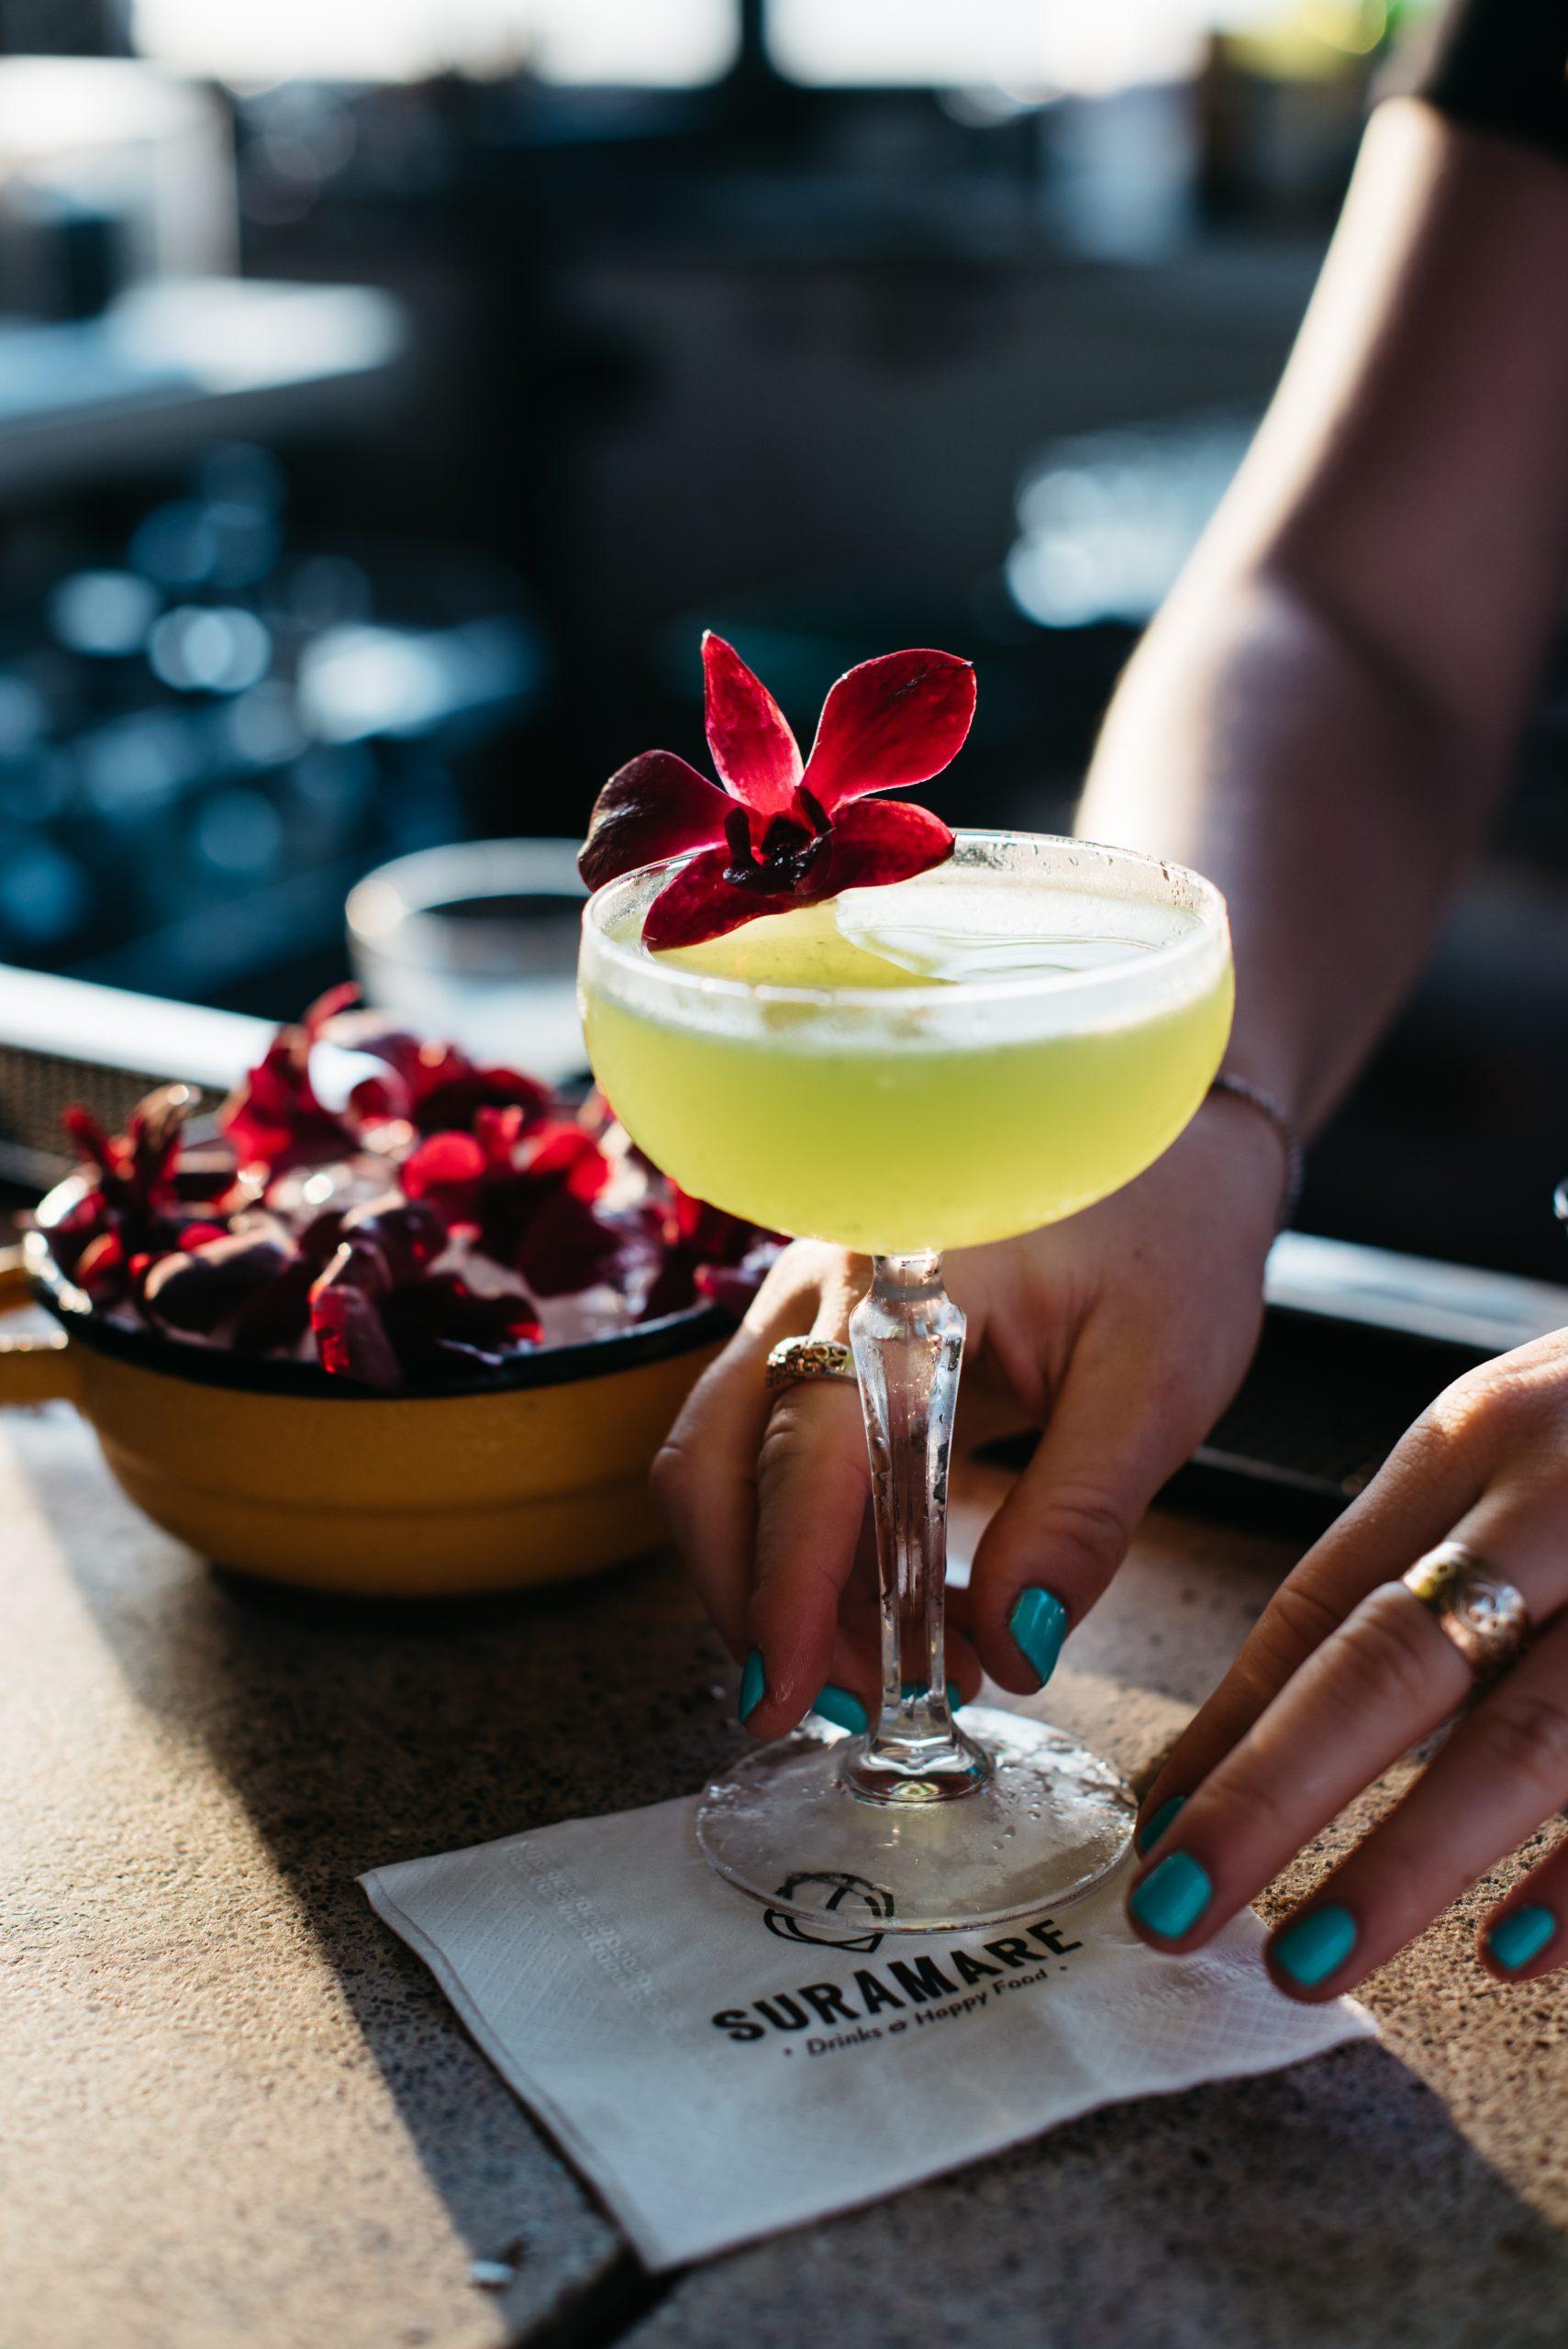 Woman's hand holding a cocktail - יד נשית מחזיקה קוקטייל